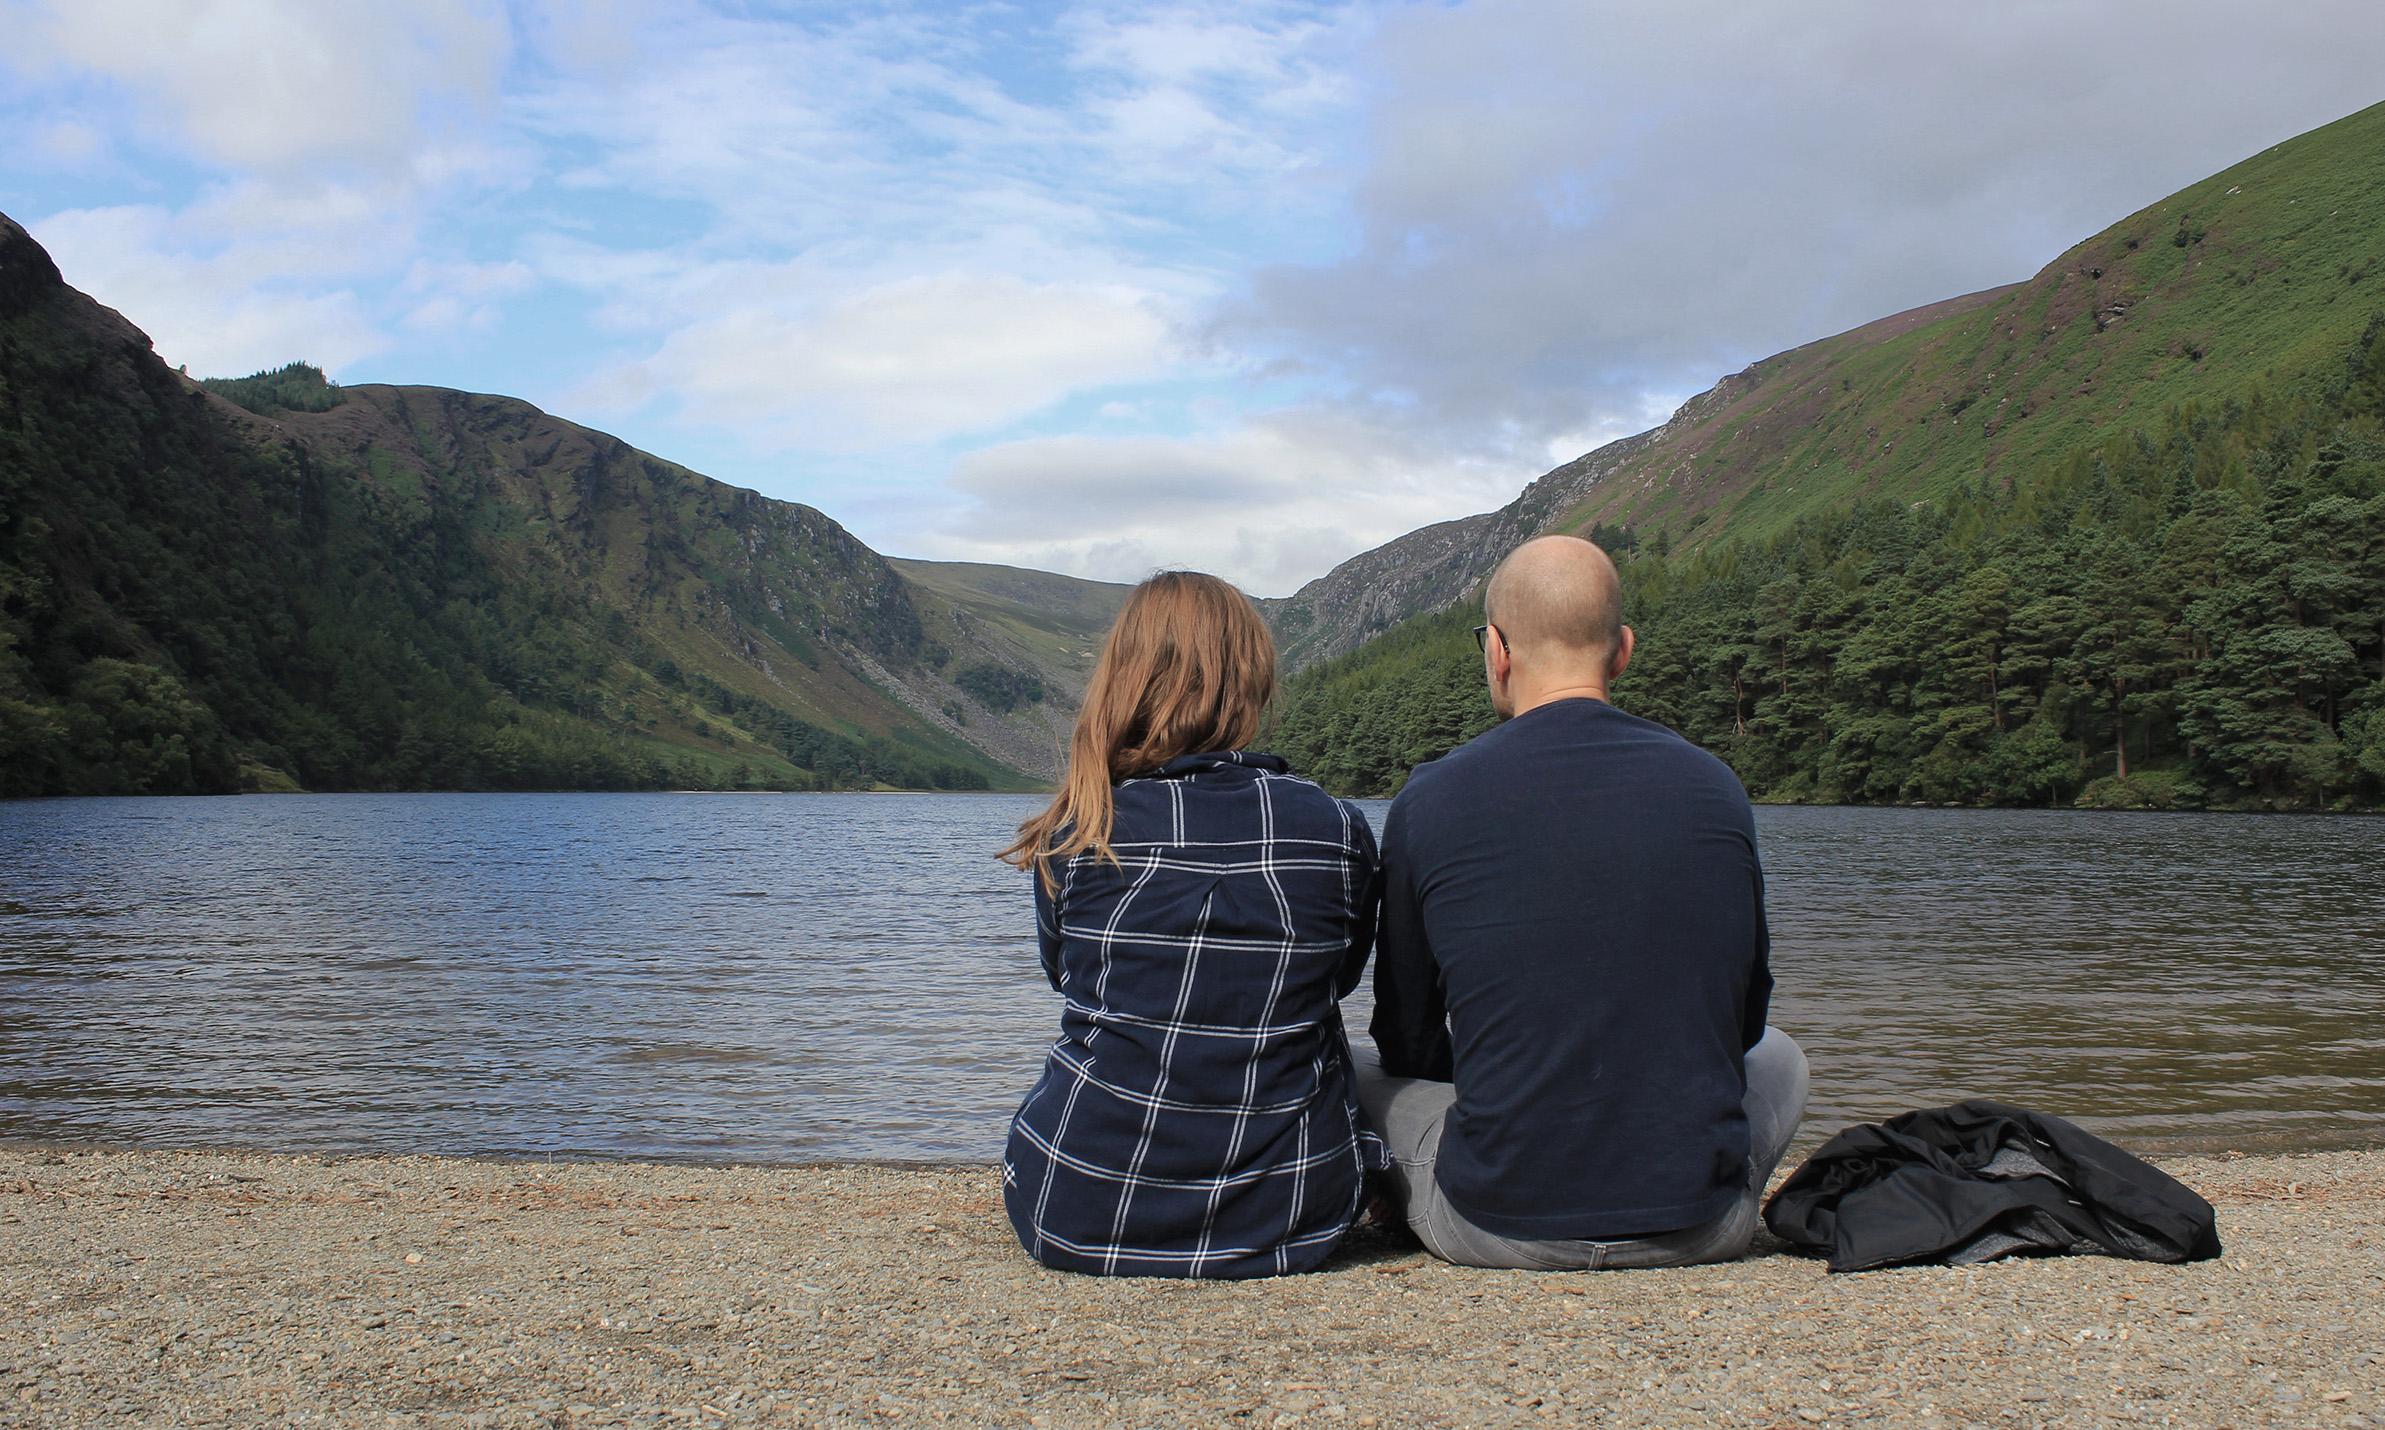 Voyages-et-compagnie.com - Blog voyage | Road trip en Irlande Galway